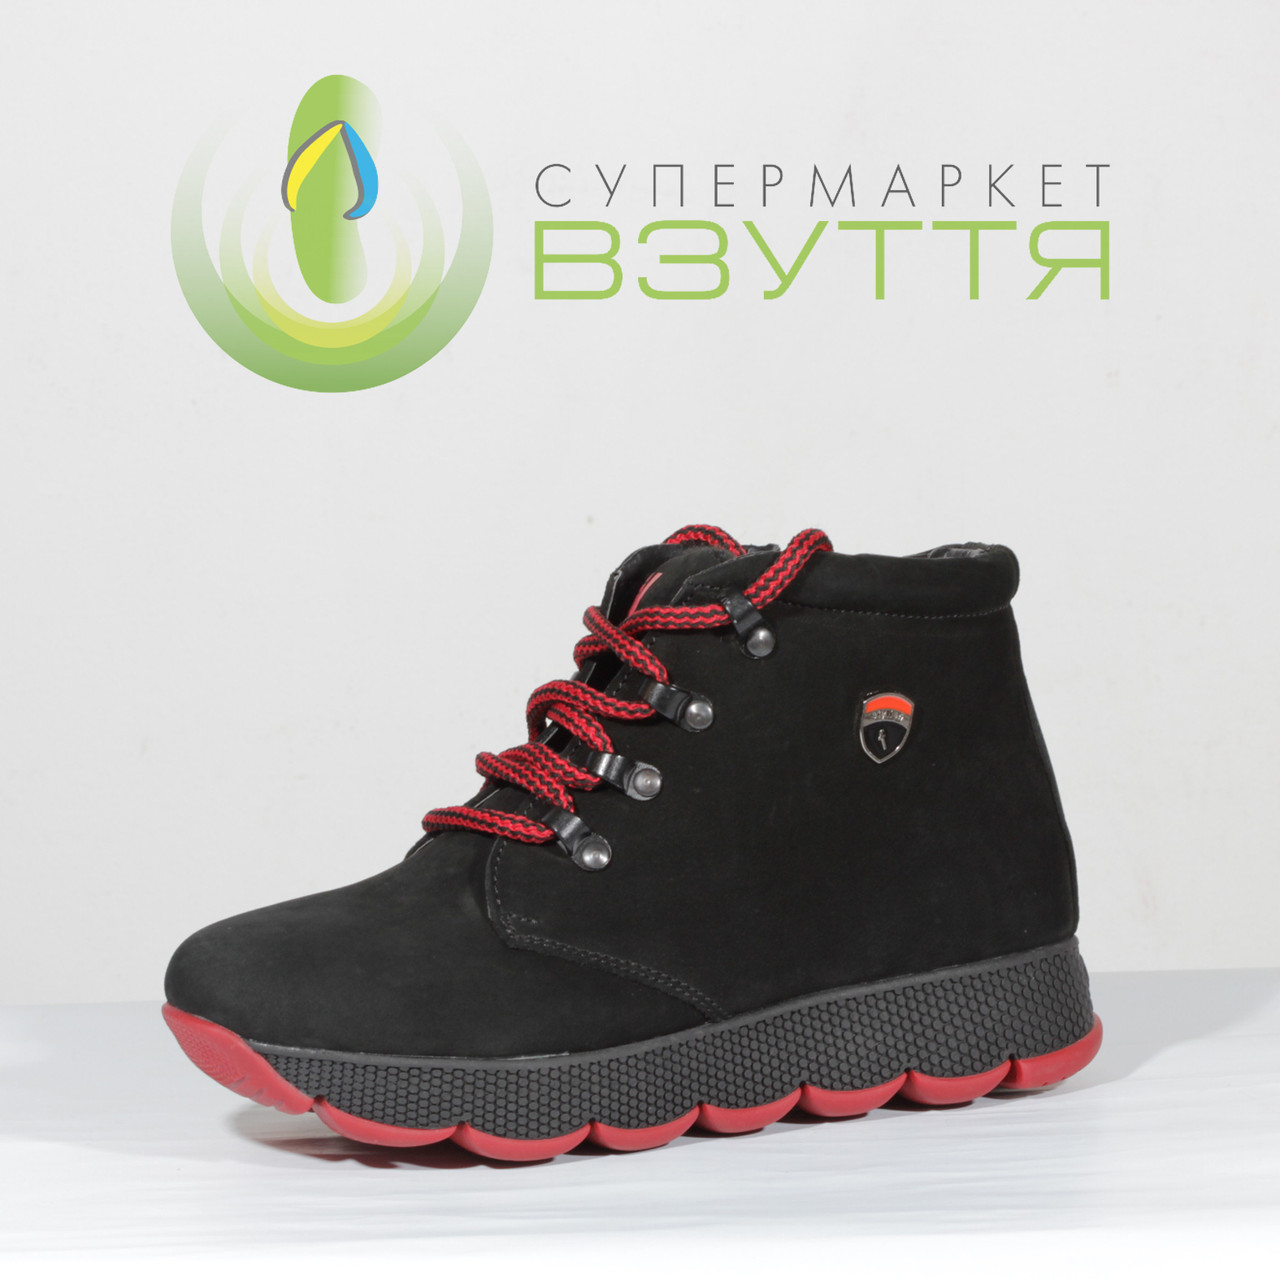 Женские короткие ботинки  на шнурках 35,36 размер